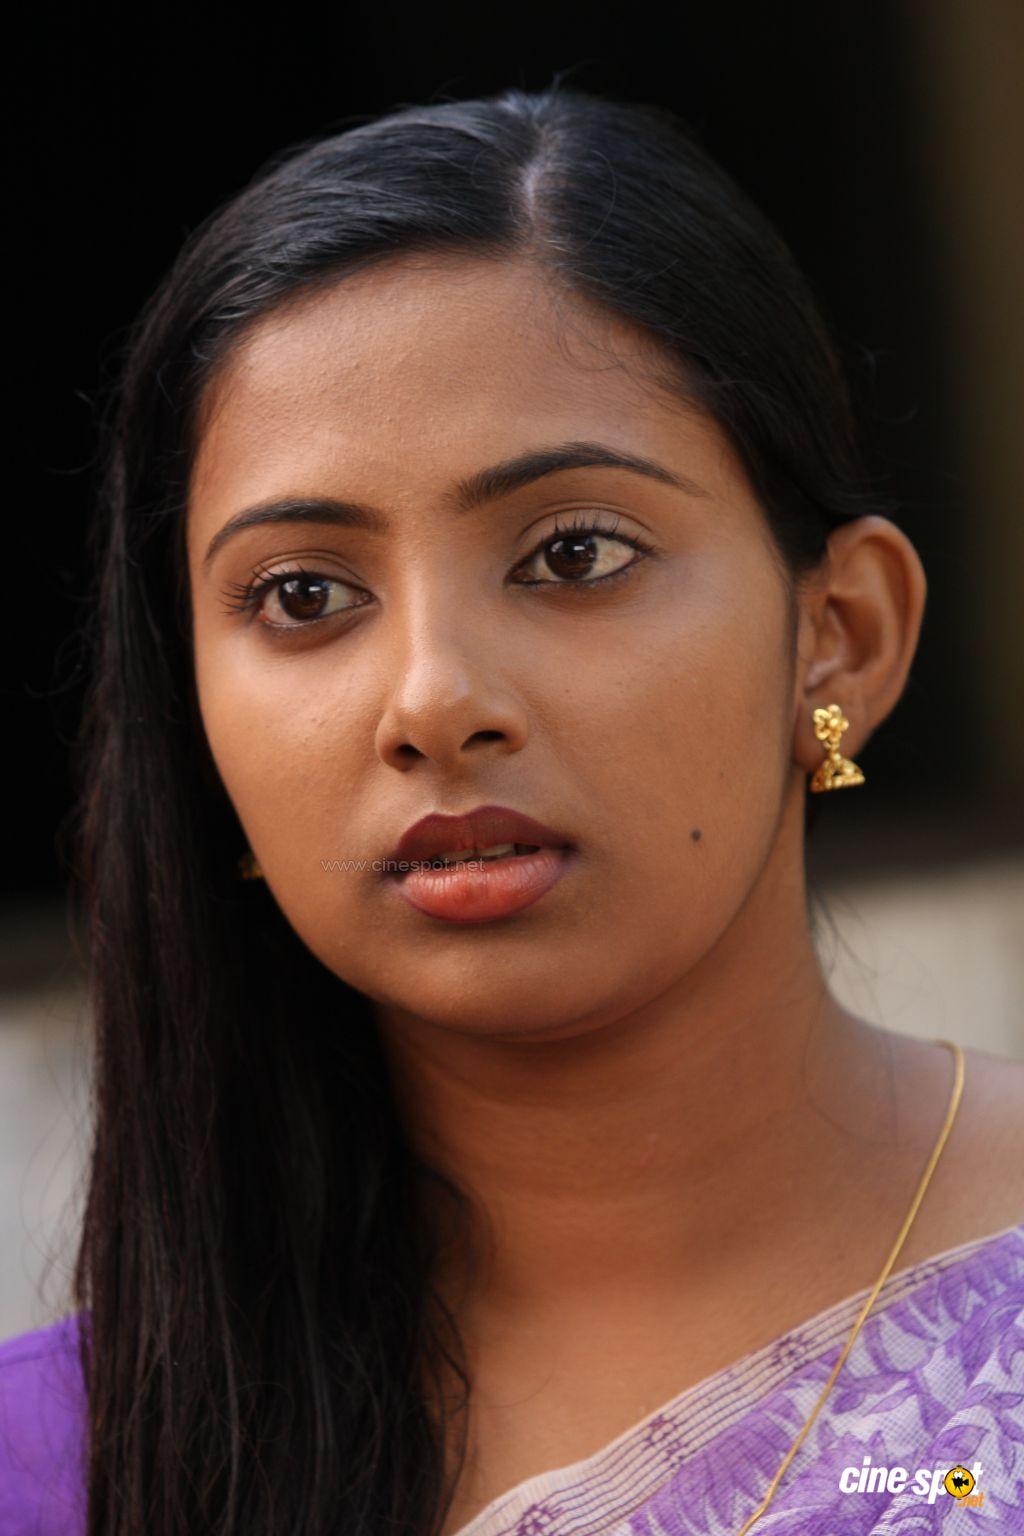 idea star singer malavika photos - Niya Malayalam Movie Serial Actress s Mallu Actress